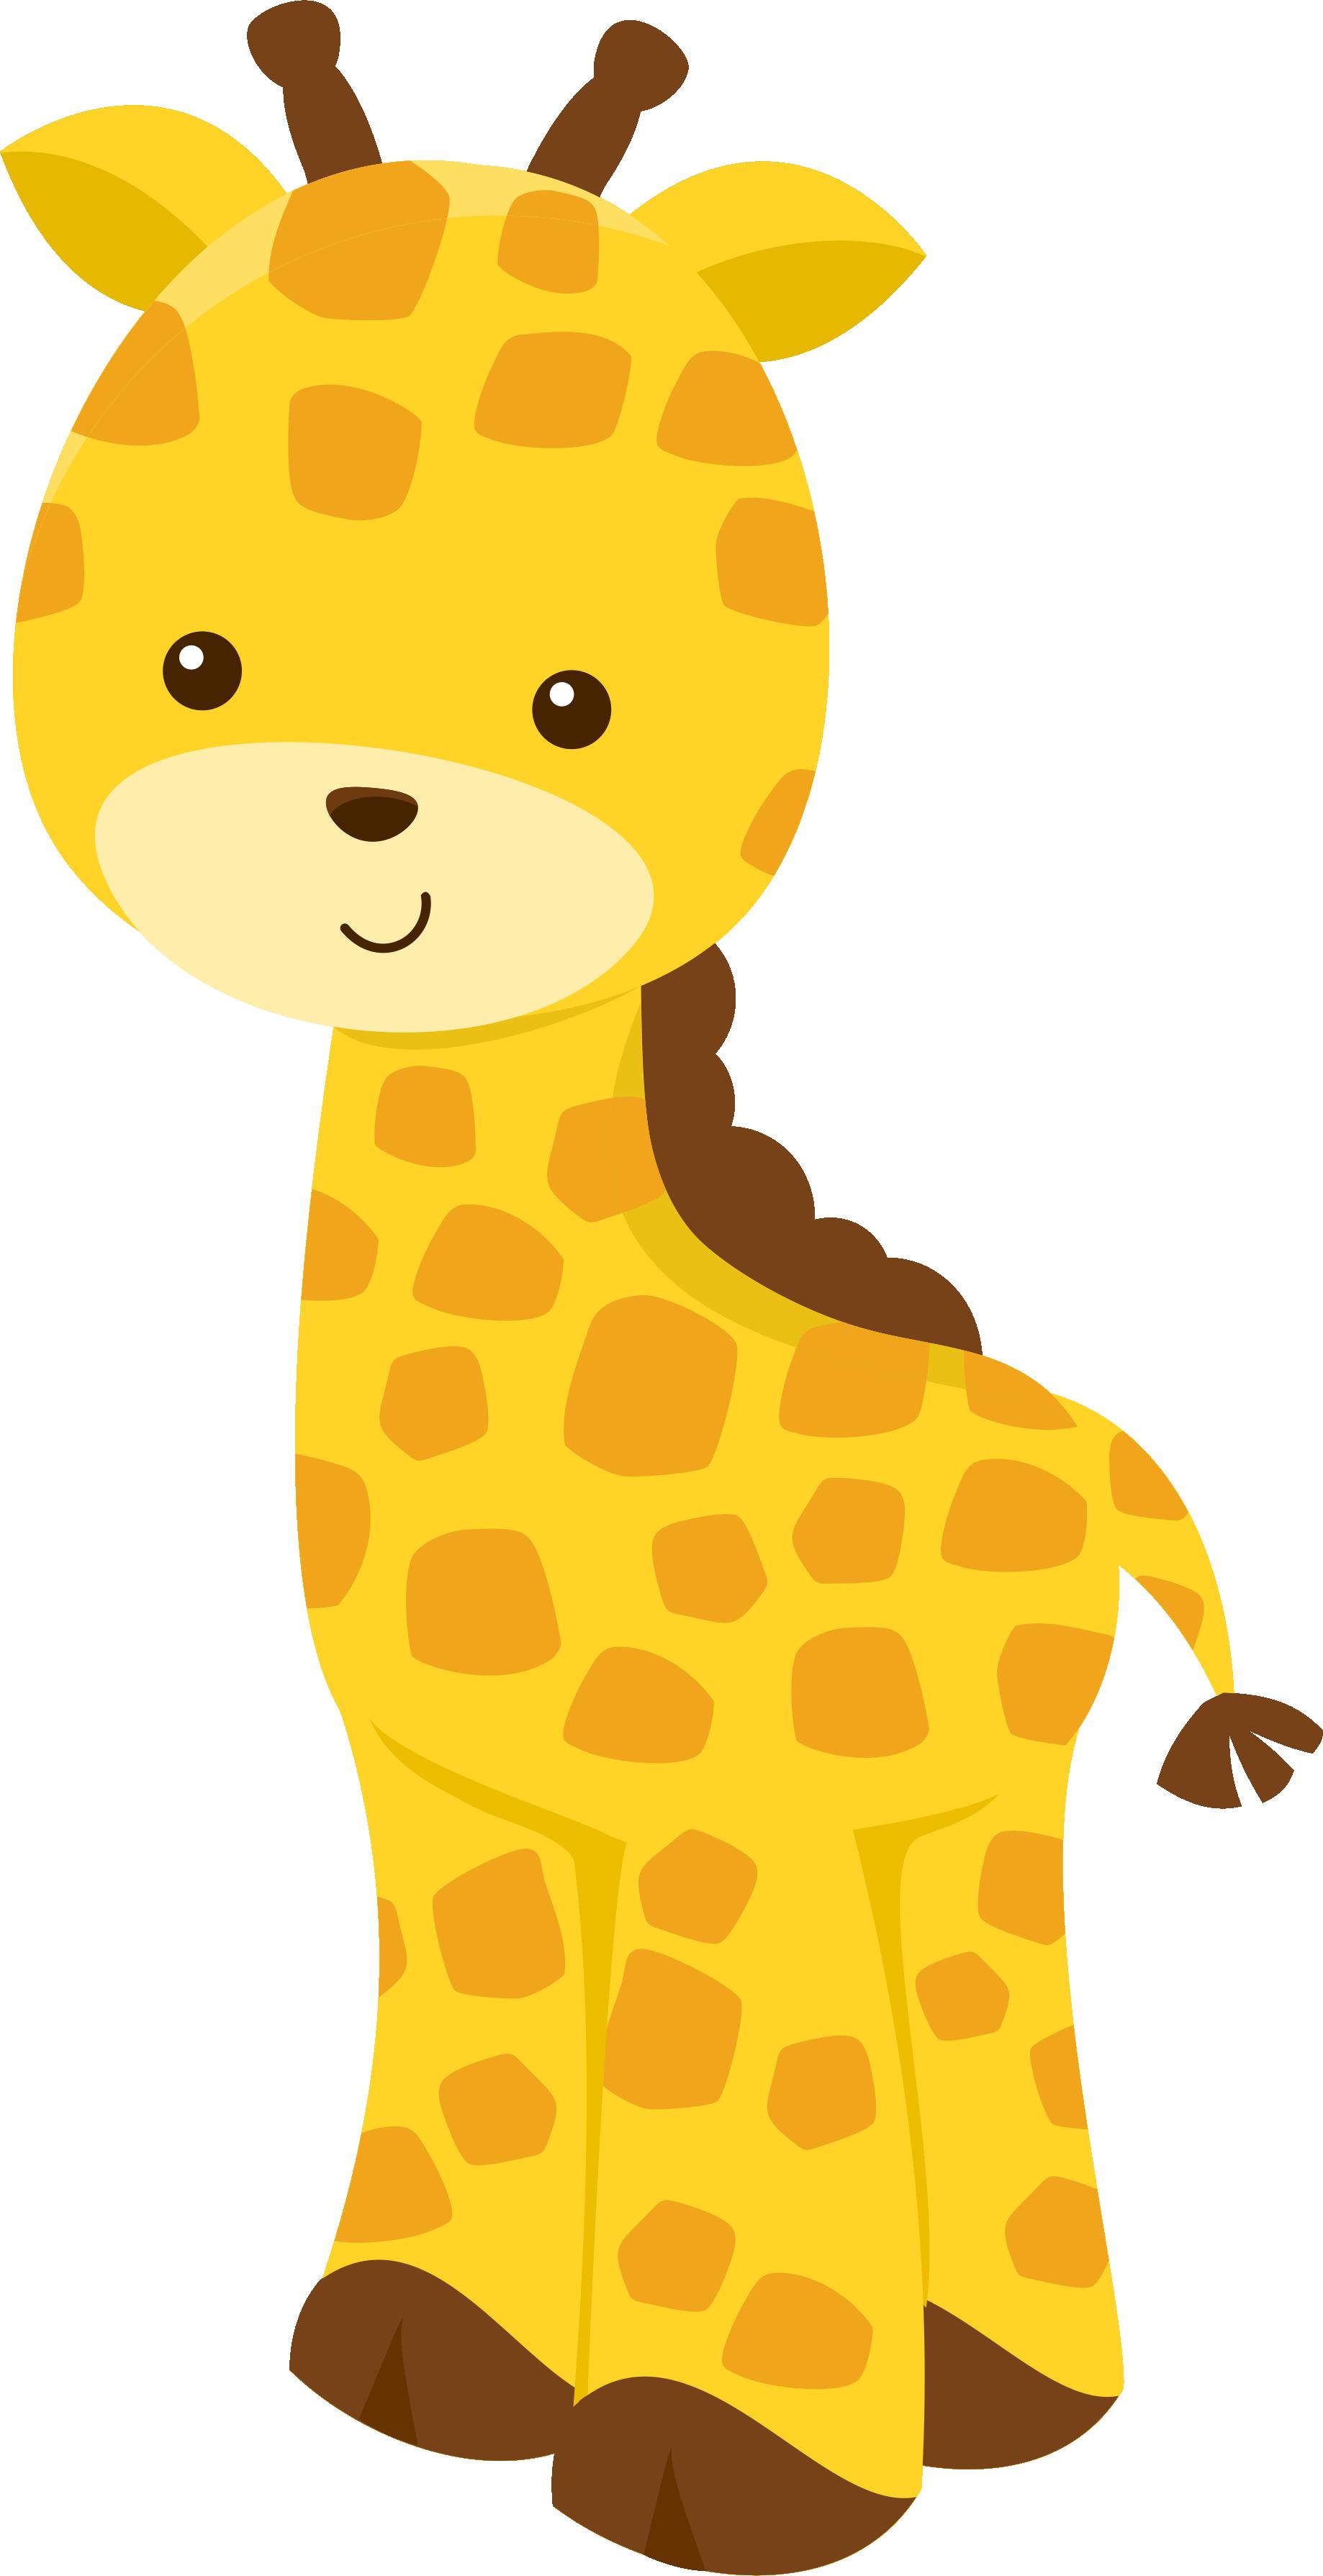 Ears clipart giraffe. Photo by flavoli minus